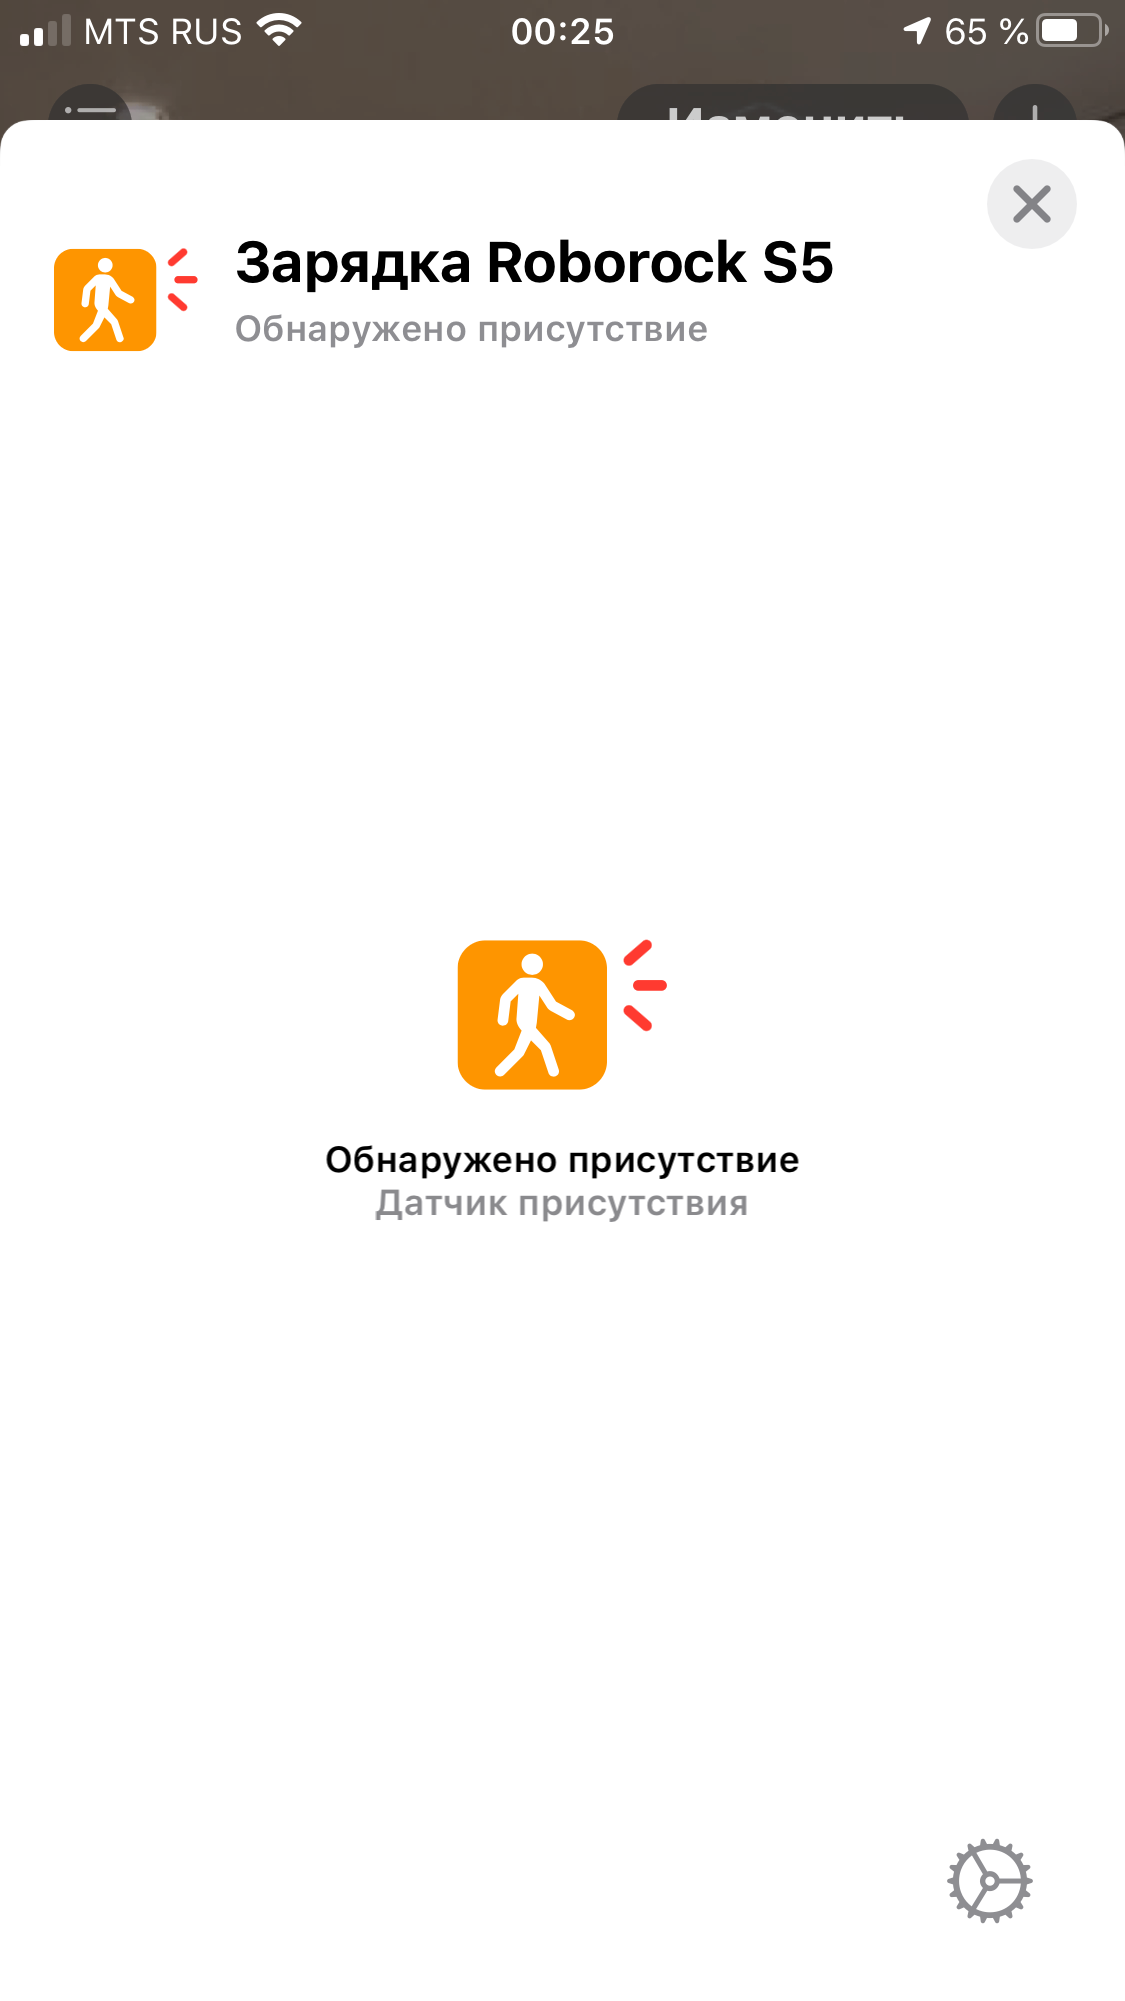 1600x_image.png?1574026168